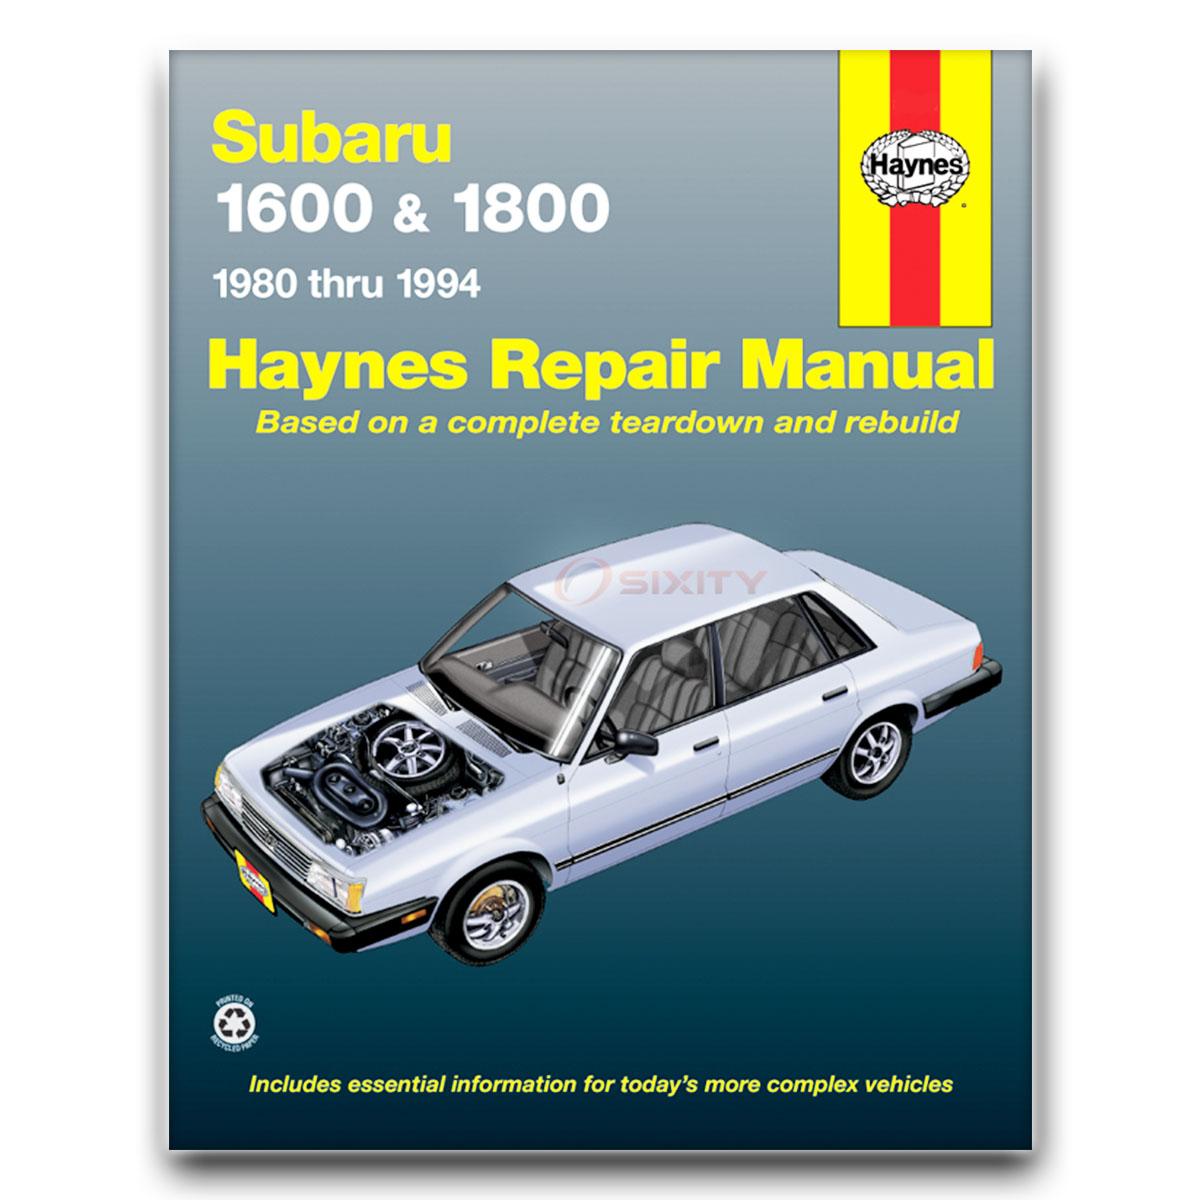 Subaru gl haynes repair manual base turbo shop service garage book xj